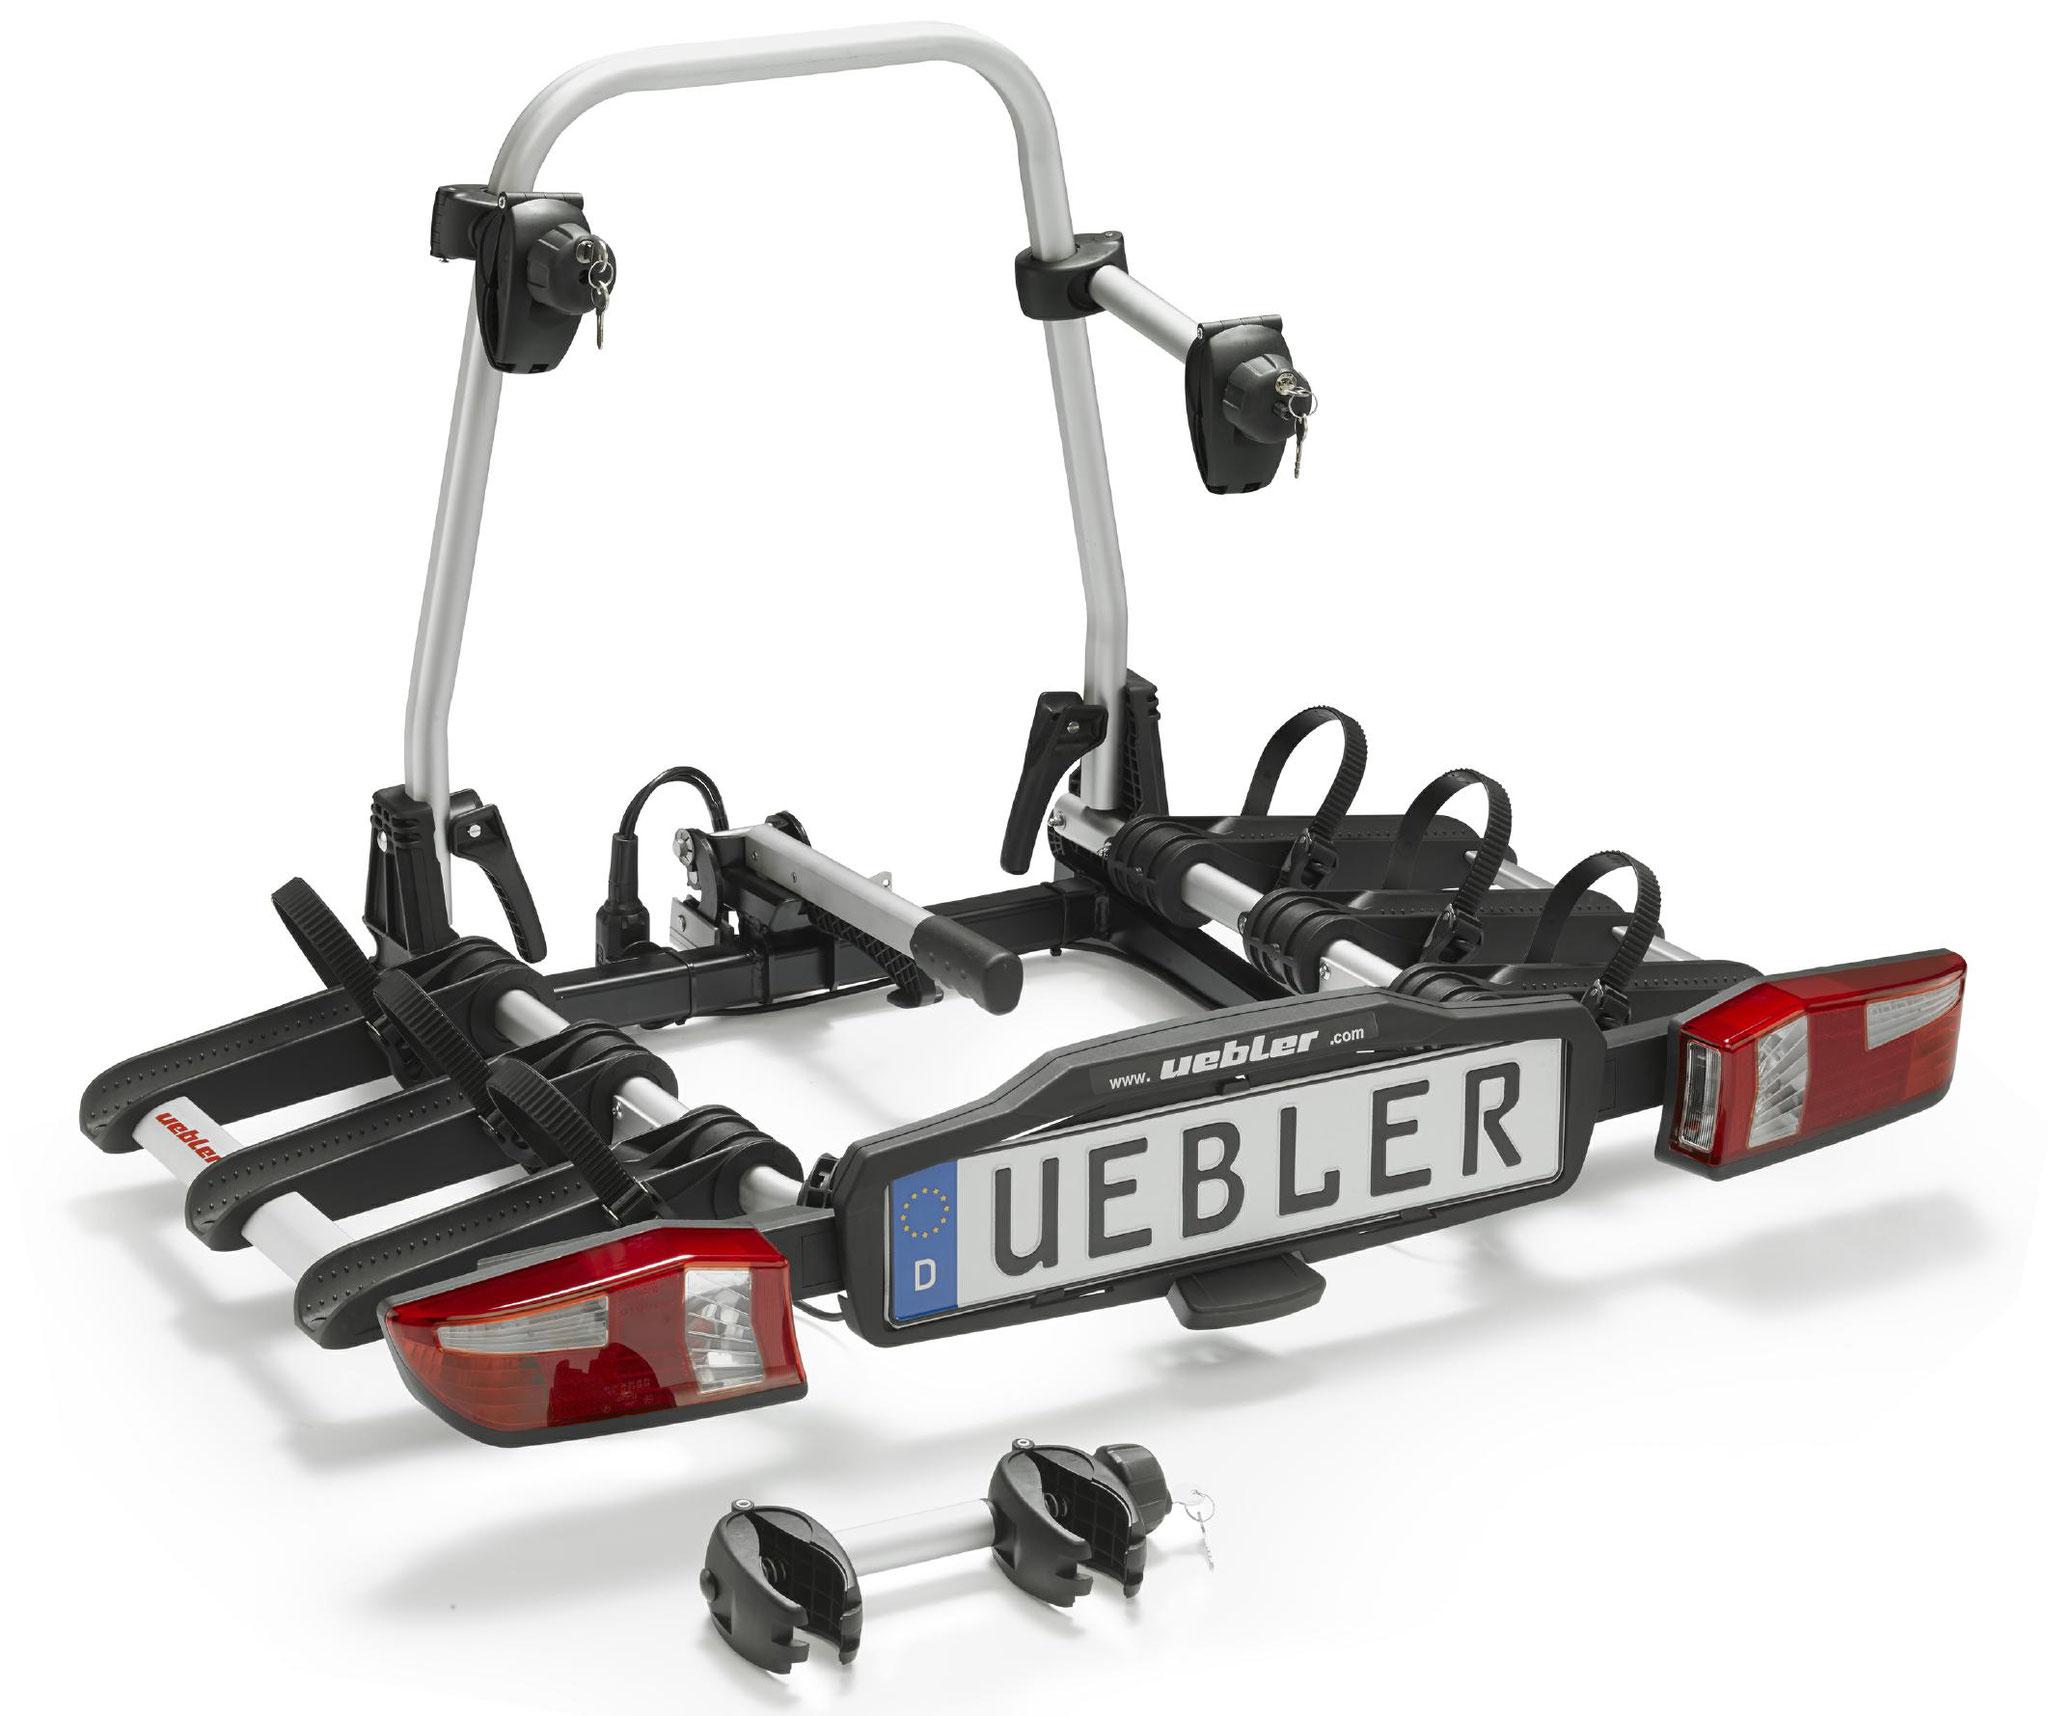 Uebler Fahrradheckträger X31 S für 3 e-Bikes